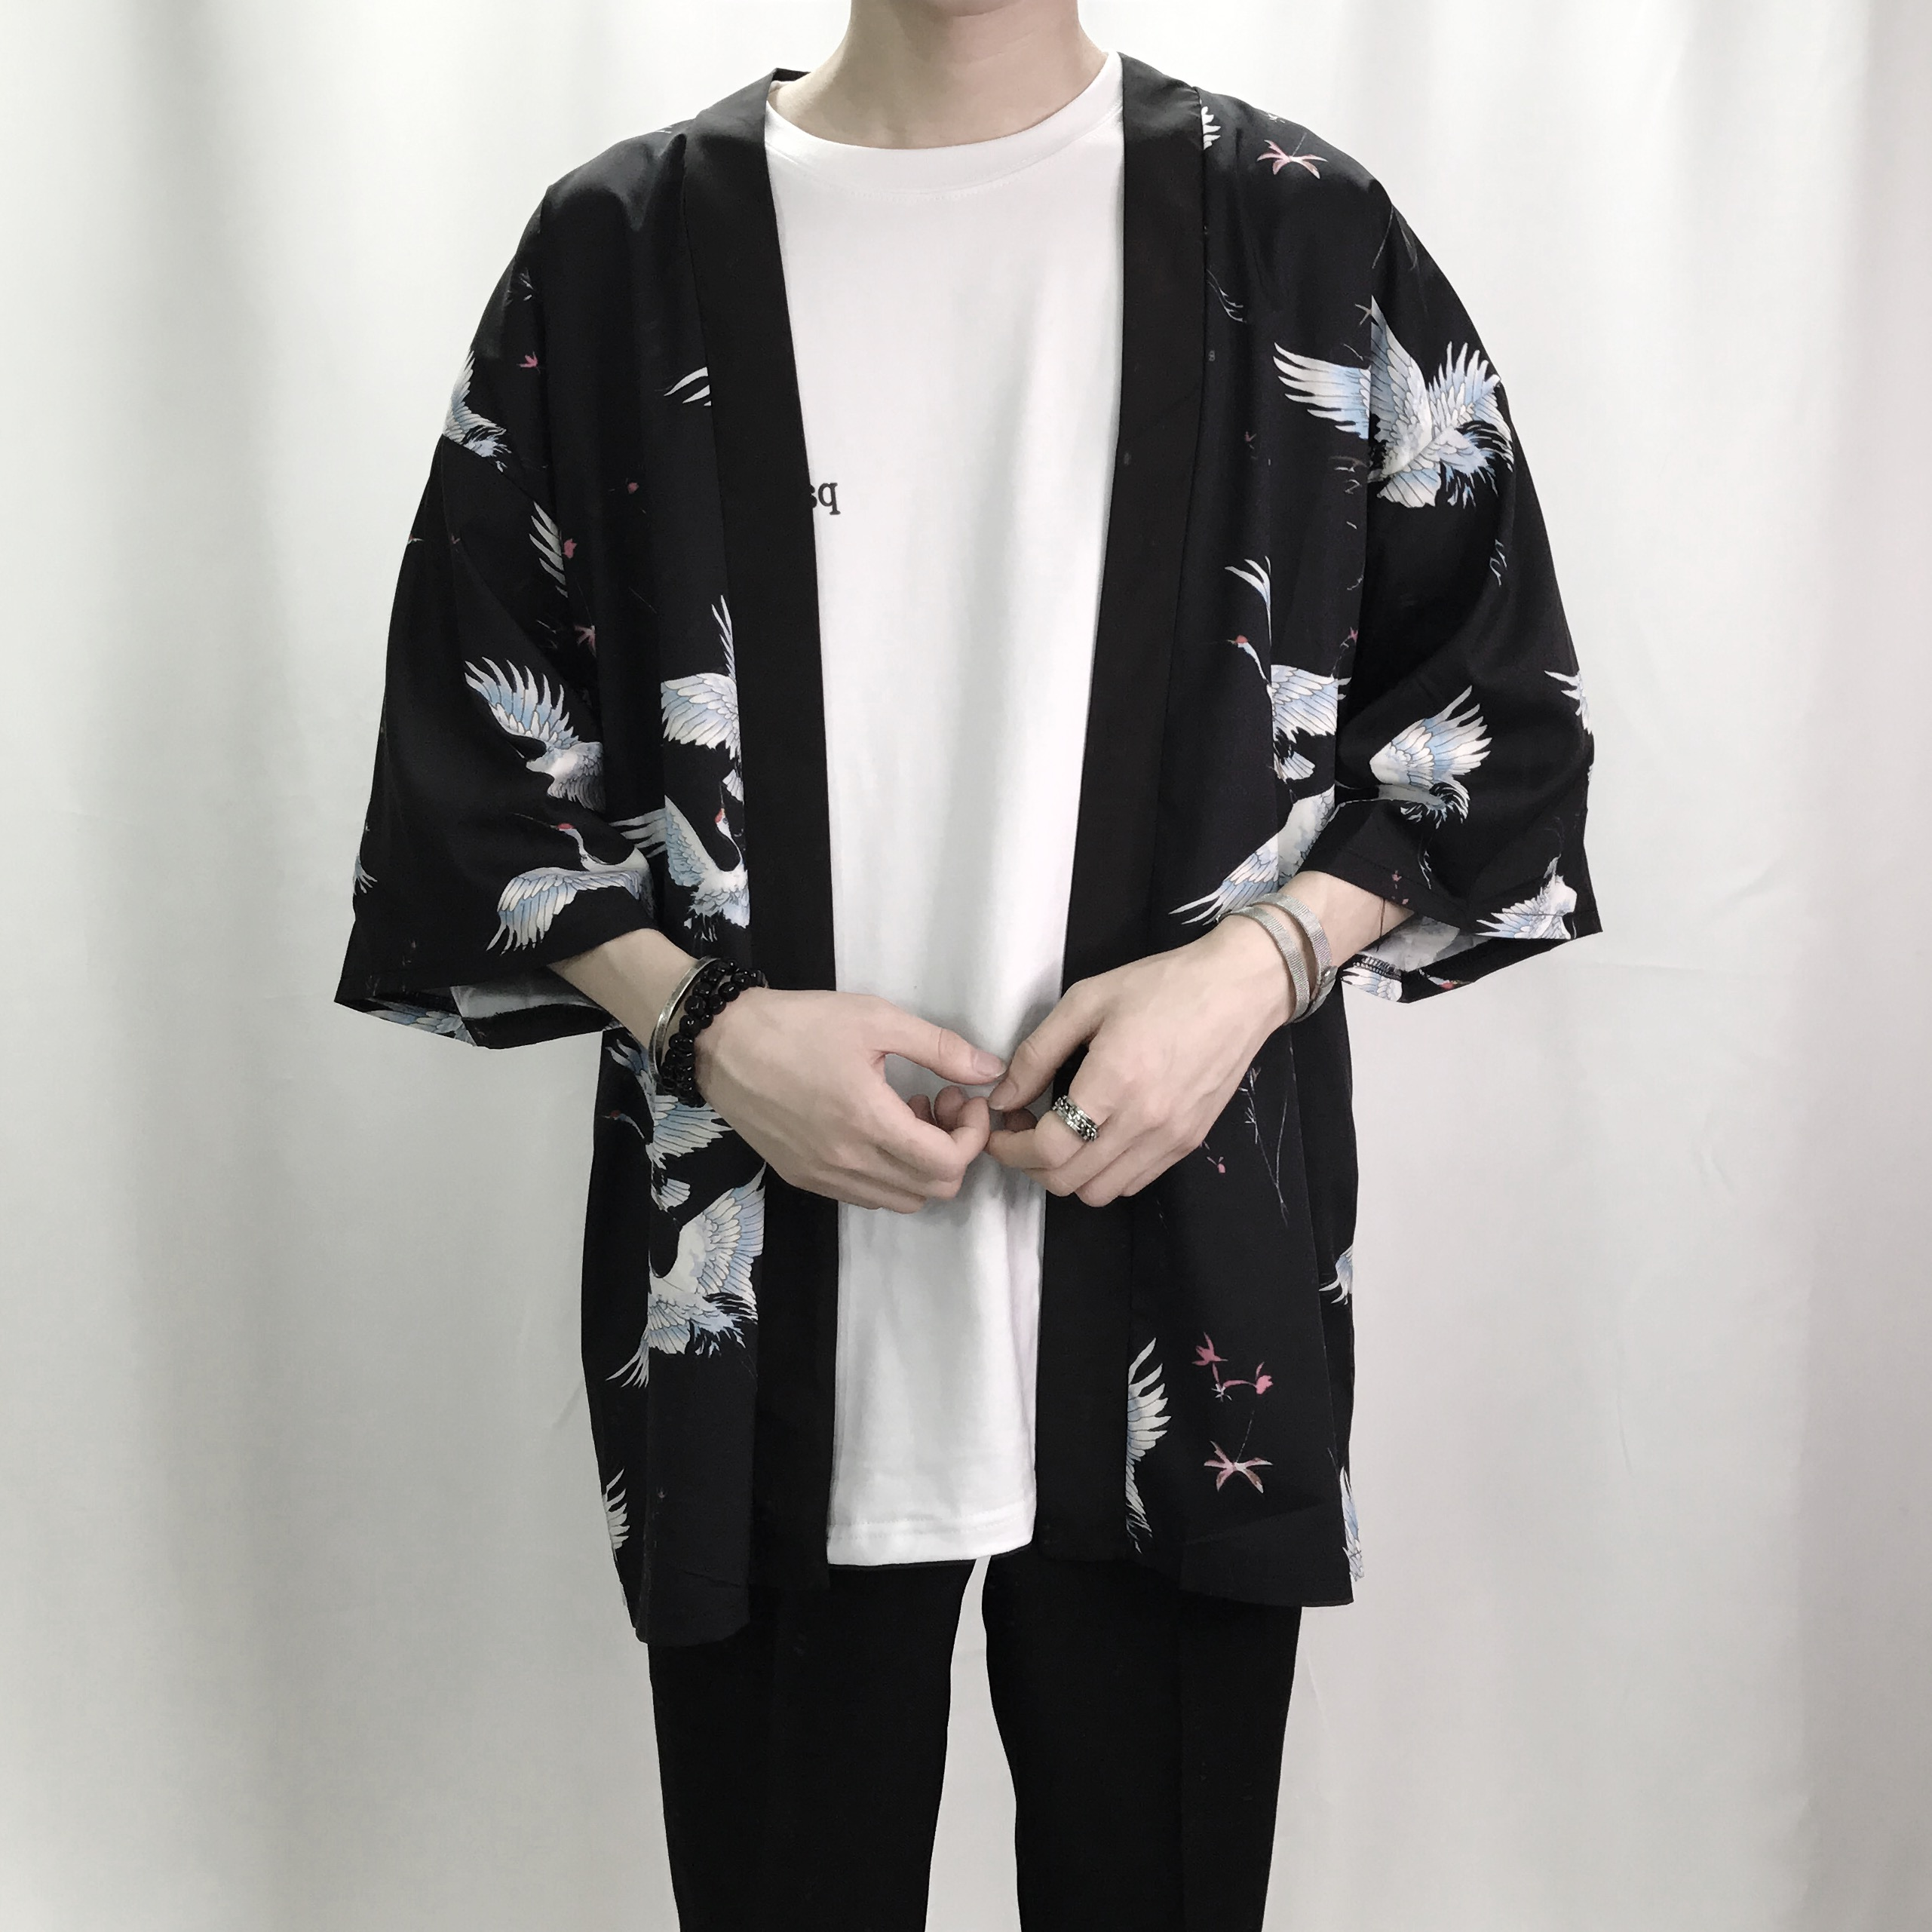 Retro Printing Fashion Men Kimono Cardigan Shirt Harajuku Street ...